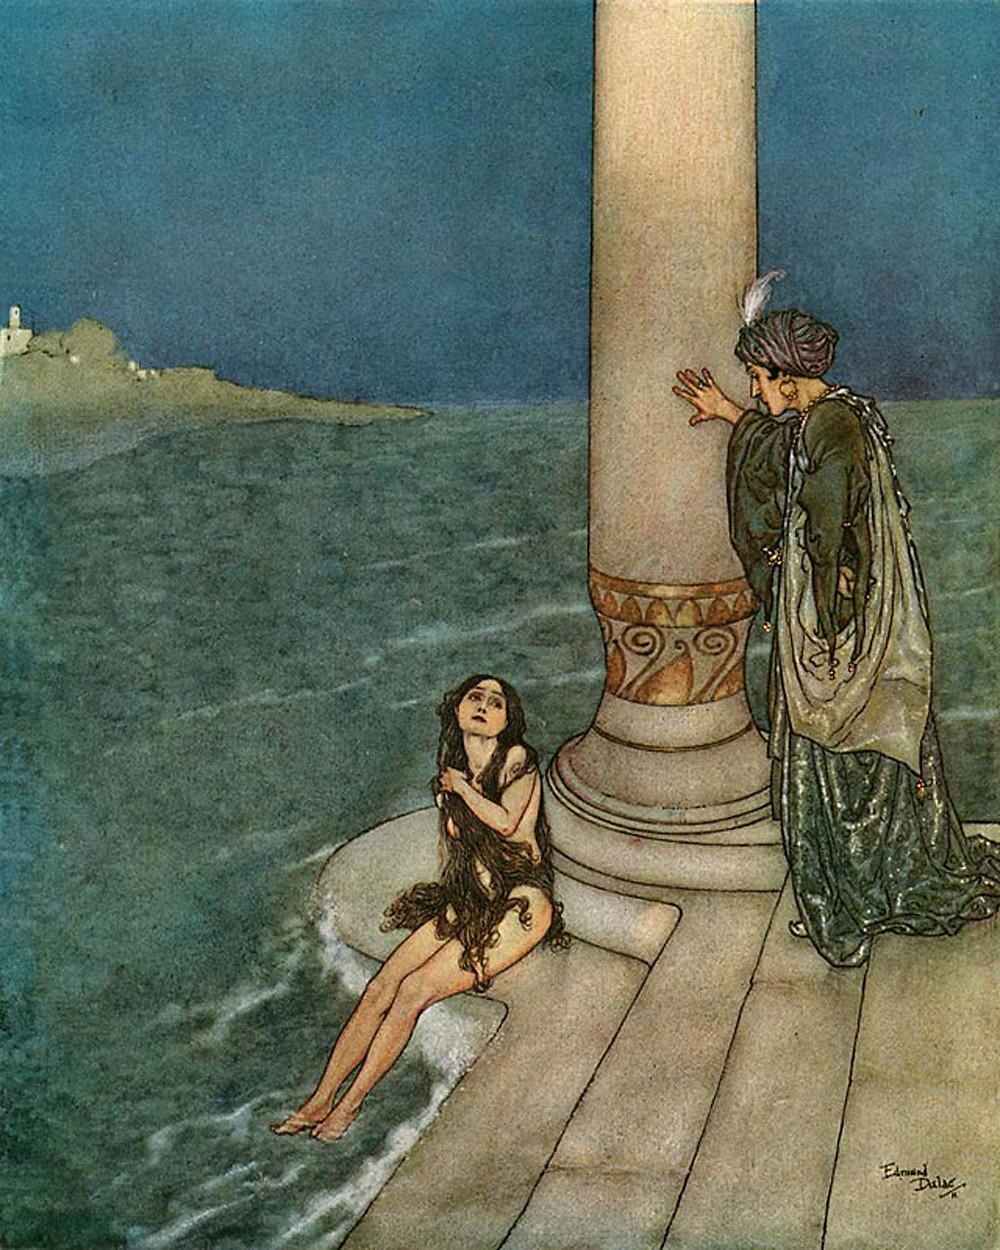 Edmund_Dulac_-_The_Mermaid_-_The_Prince.jpg